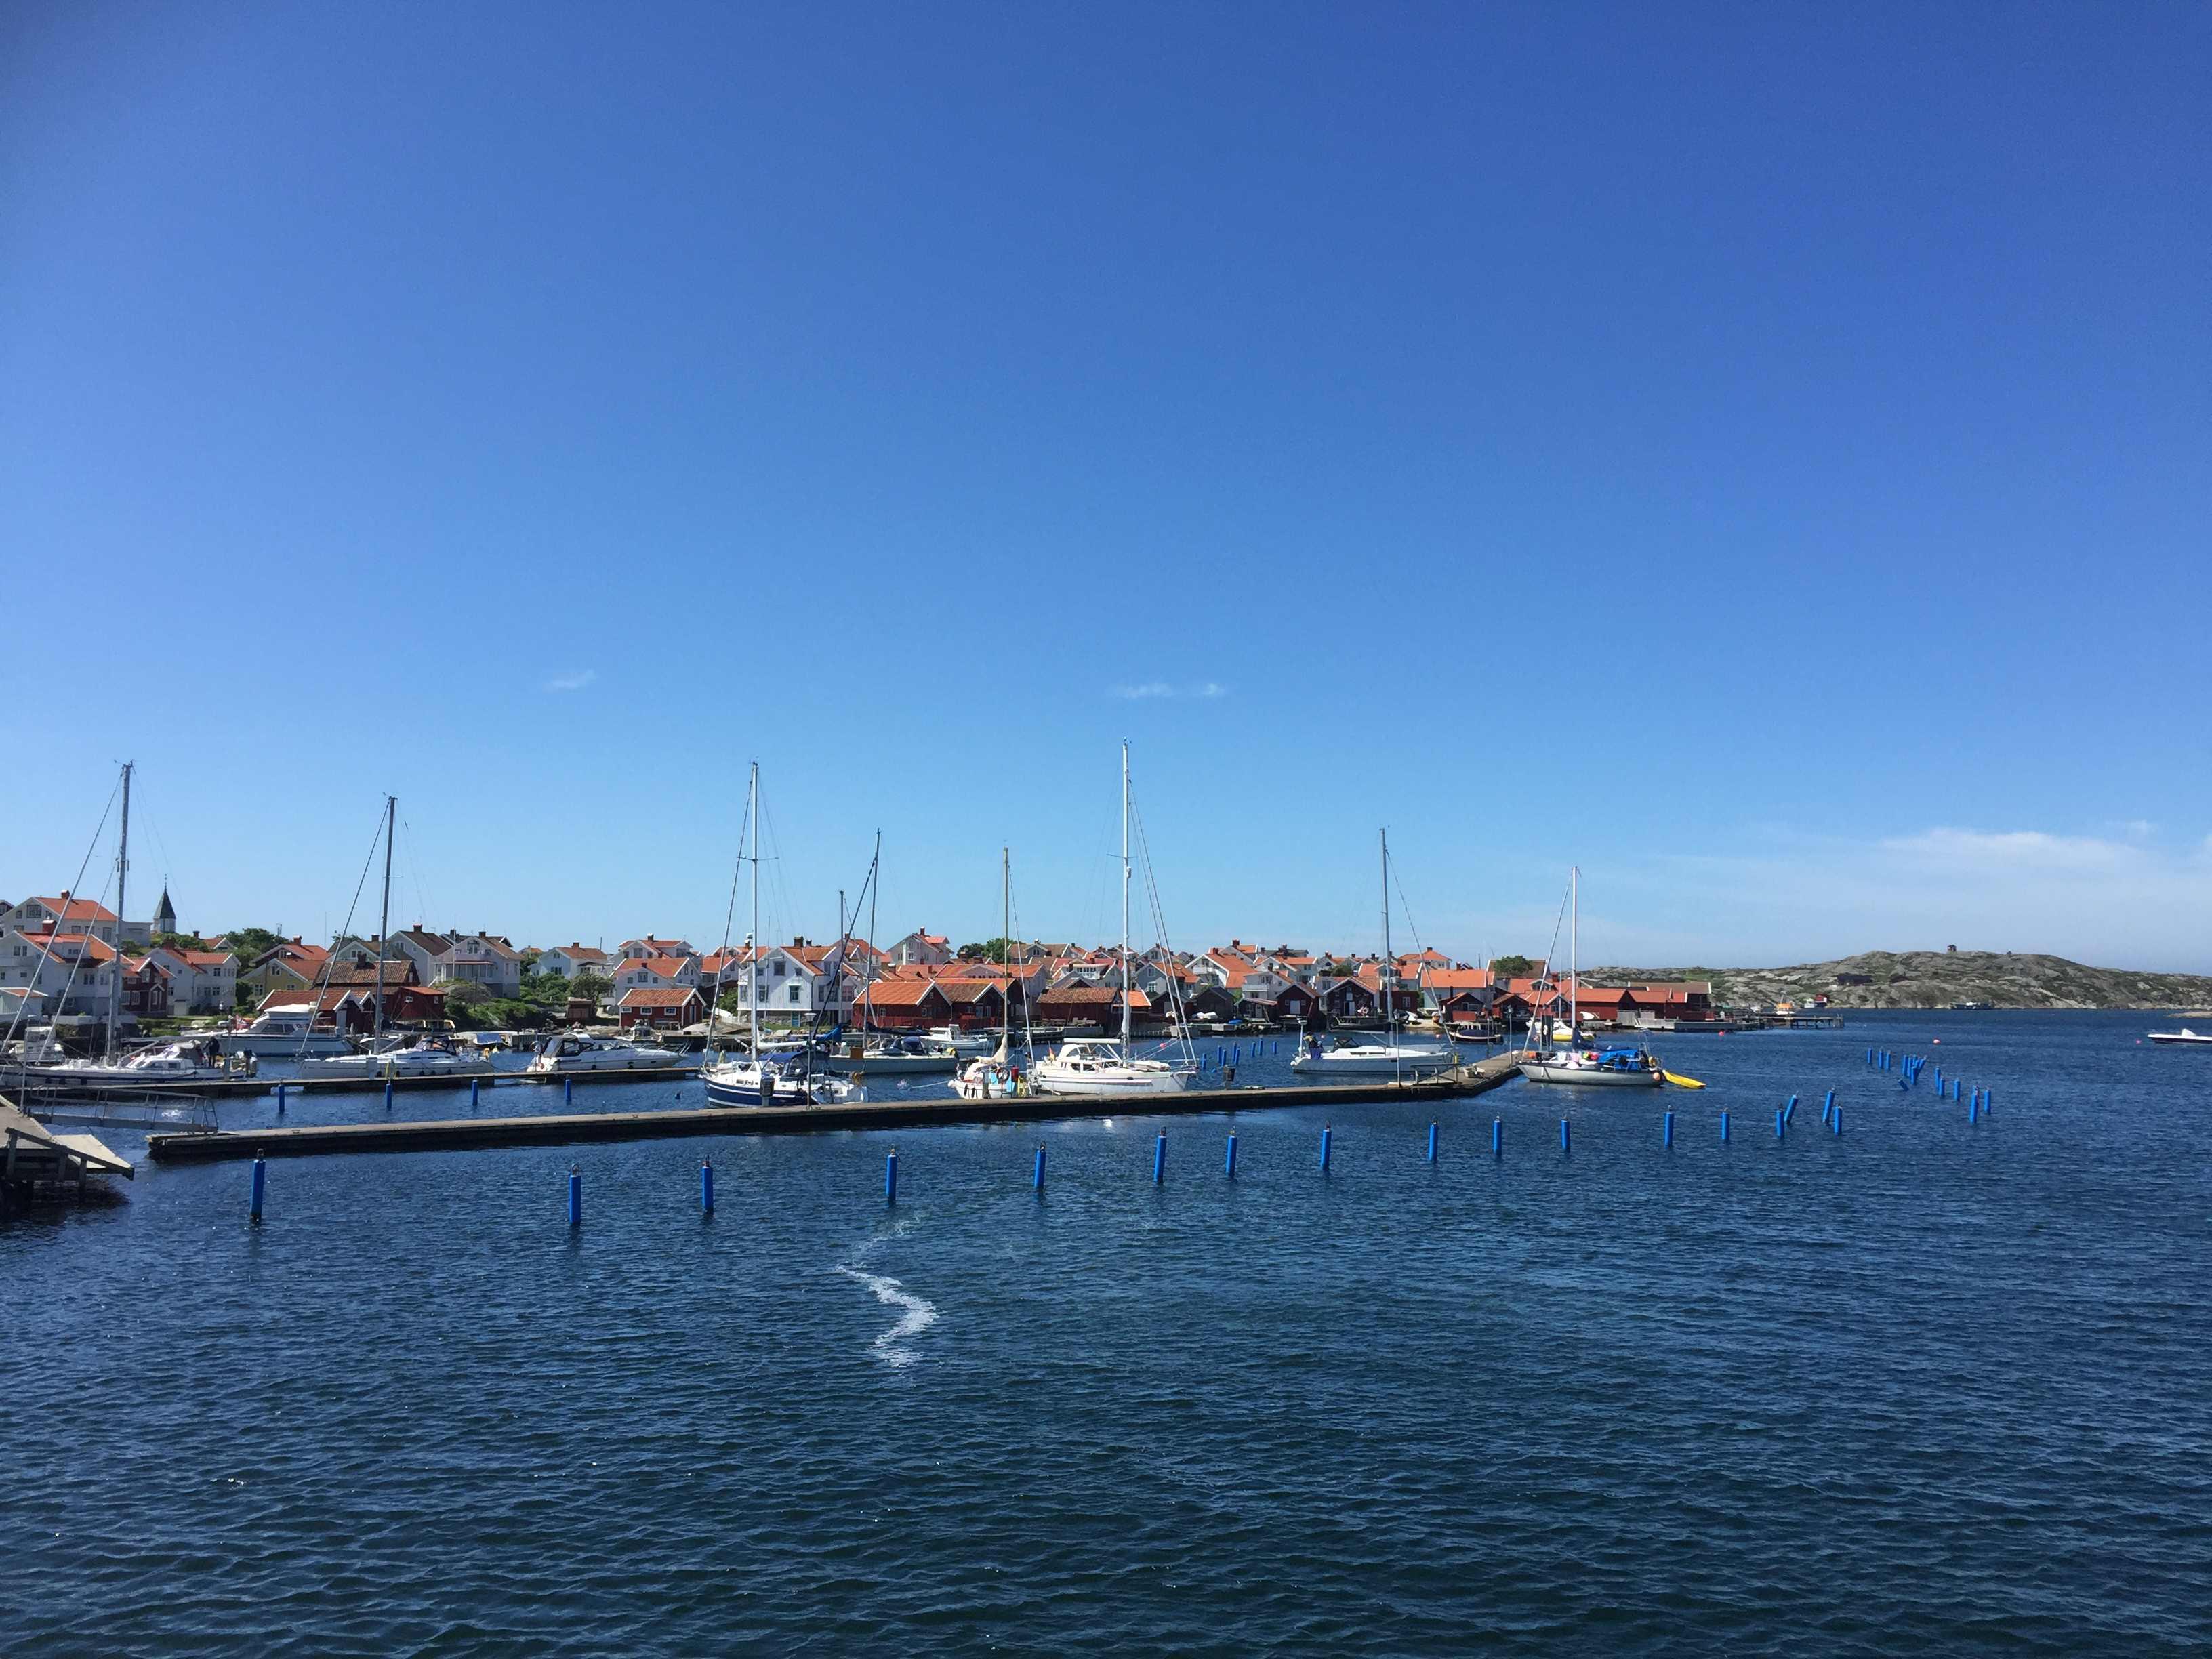 IMG 9391 1024x768 - The Dorsia Design Hotel in Göteborg, Sweden